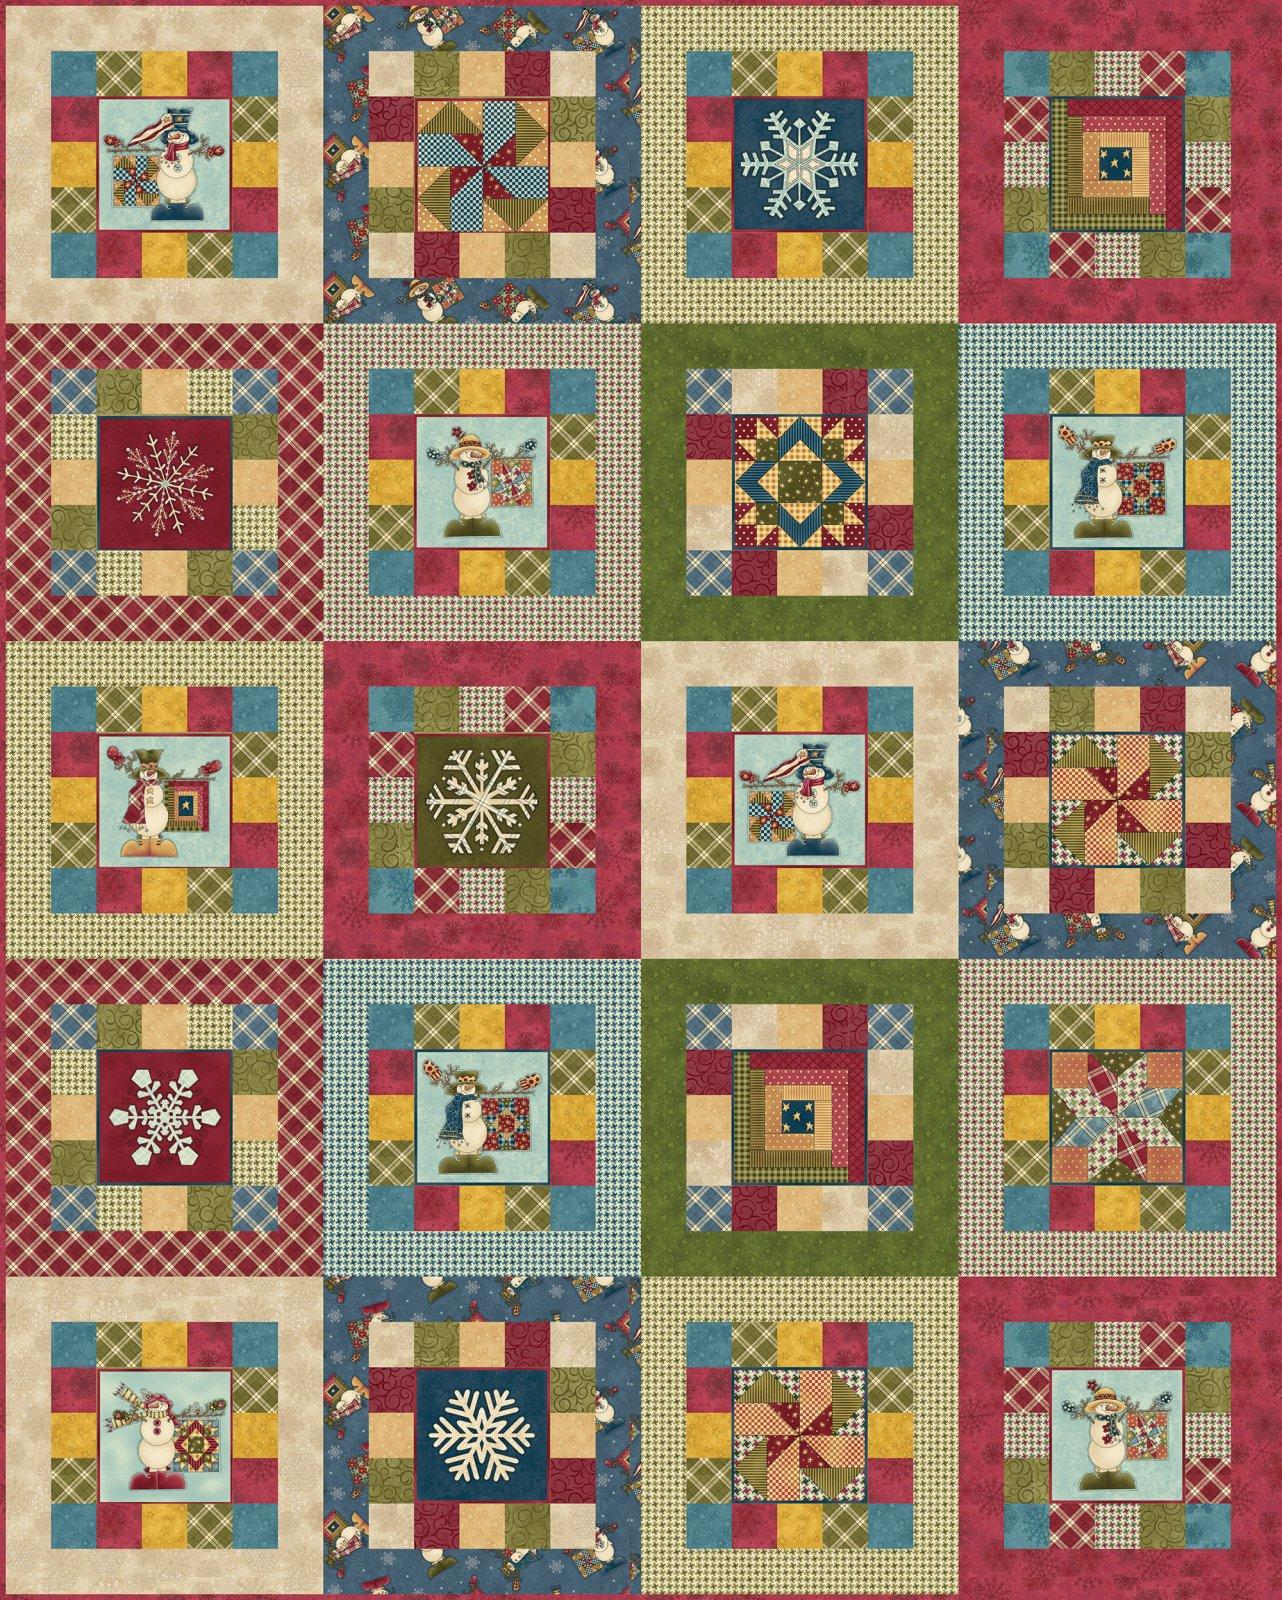 My Precious Quilt - Block Quilt Kit